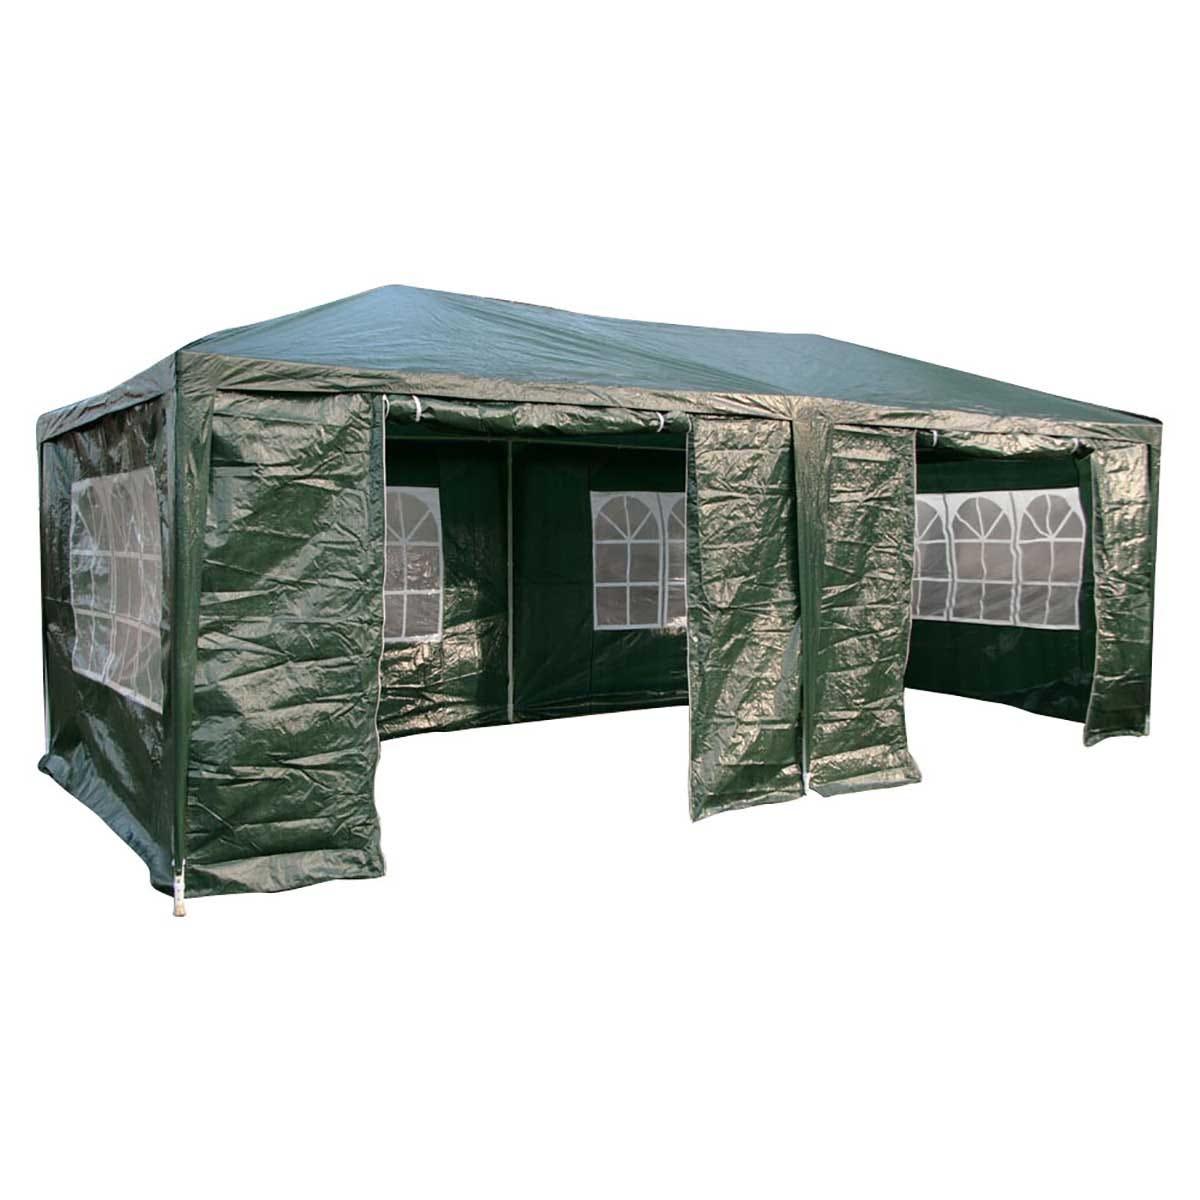 Airwave 6m x 3m Value Party Tent Gazebo - Green